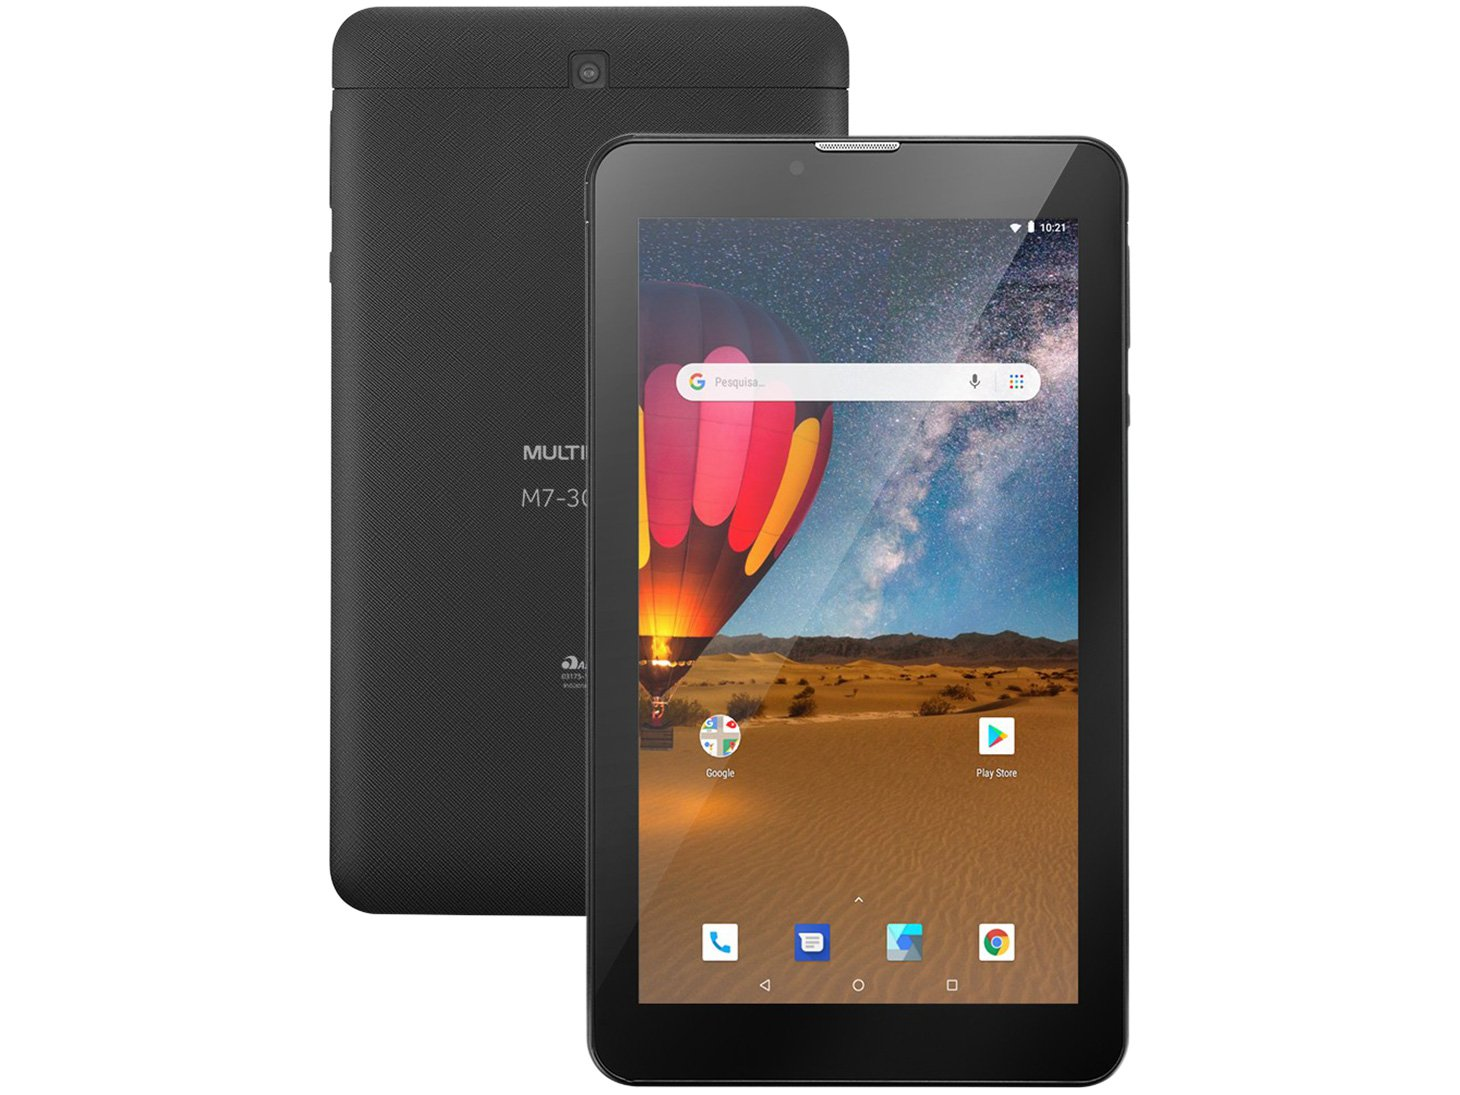 "Tablet Multilaser M7 3G Plus NB304 16GB 7"" - 3G Wi-Fi Android 8.0 Quad Core Câmera Integrada - Bivolt"